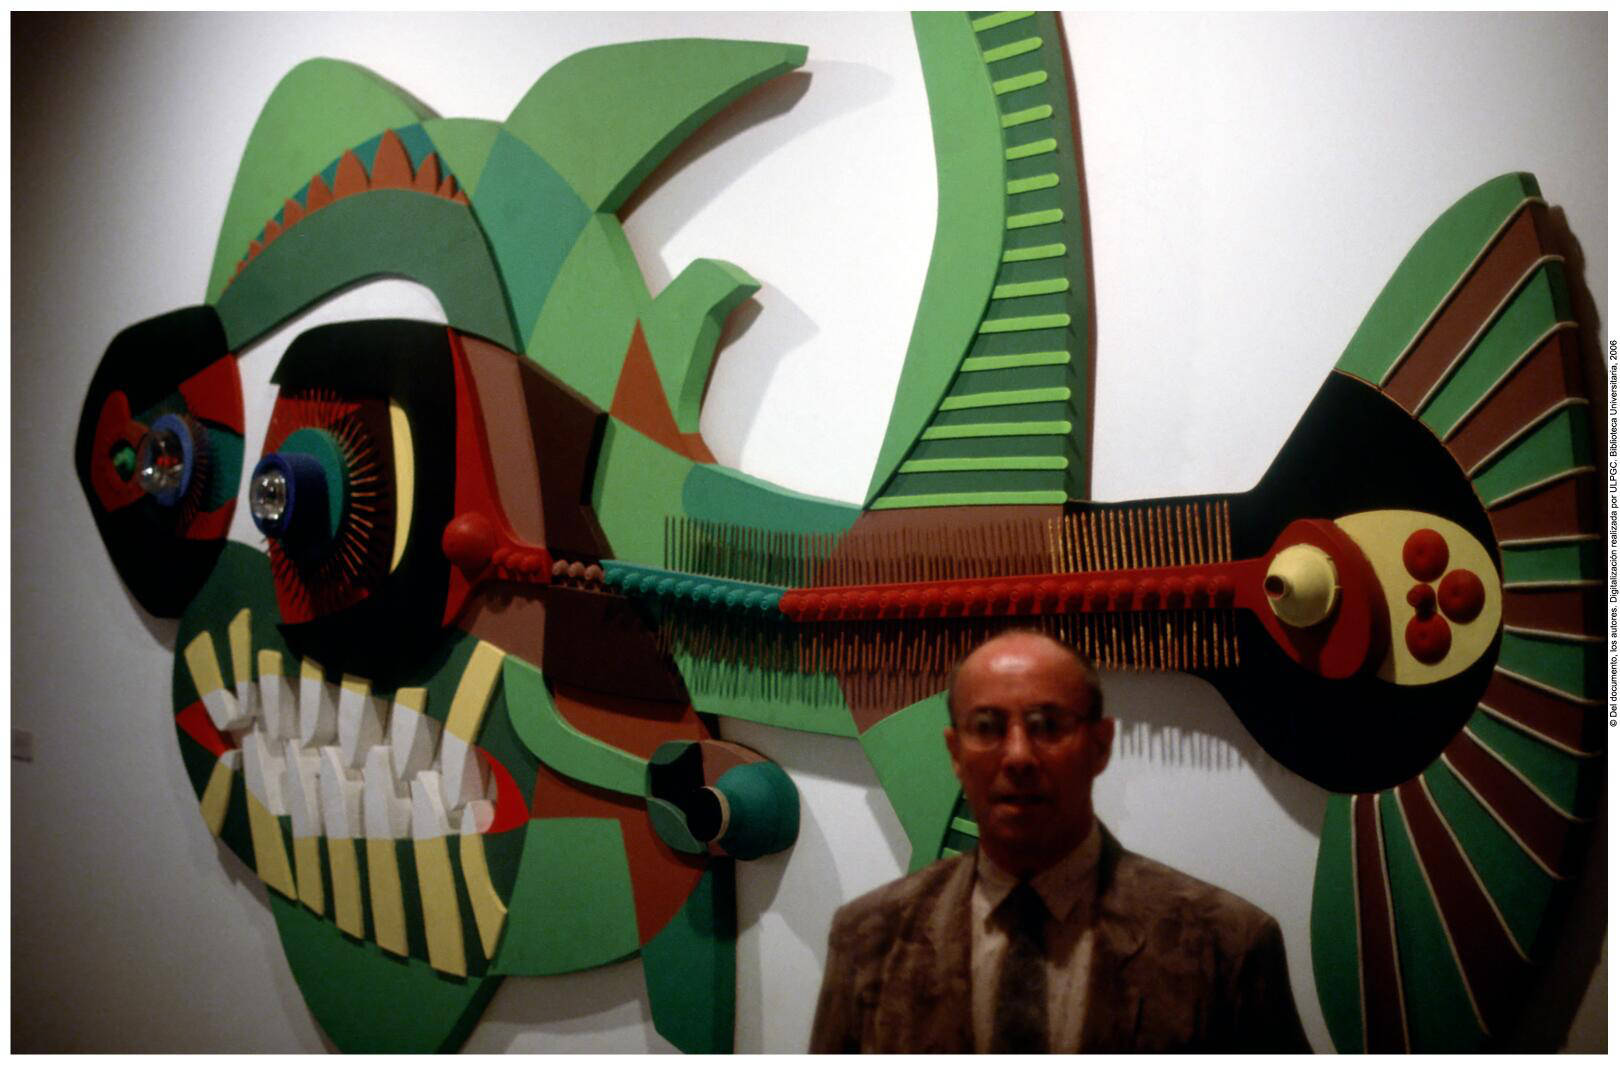 Exposición de César Manrique en Gran Canaria